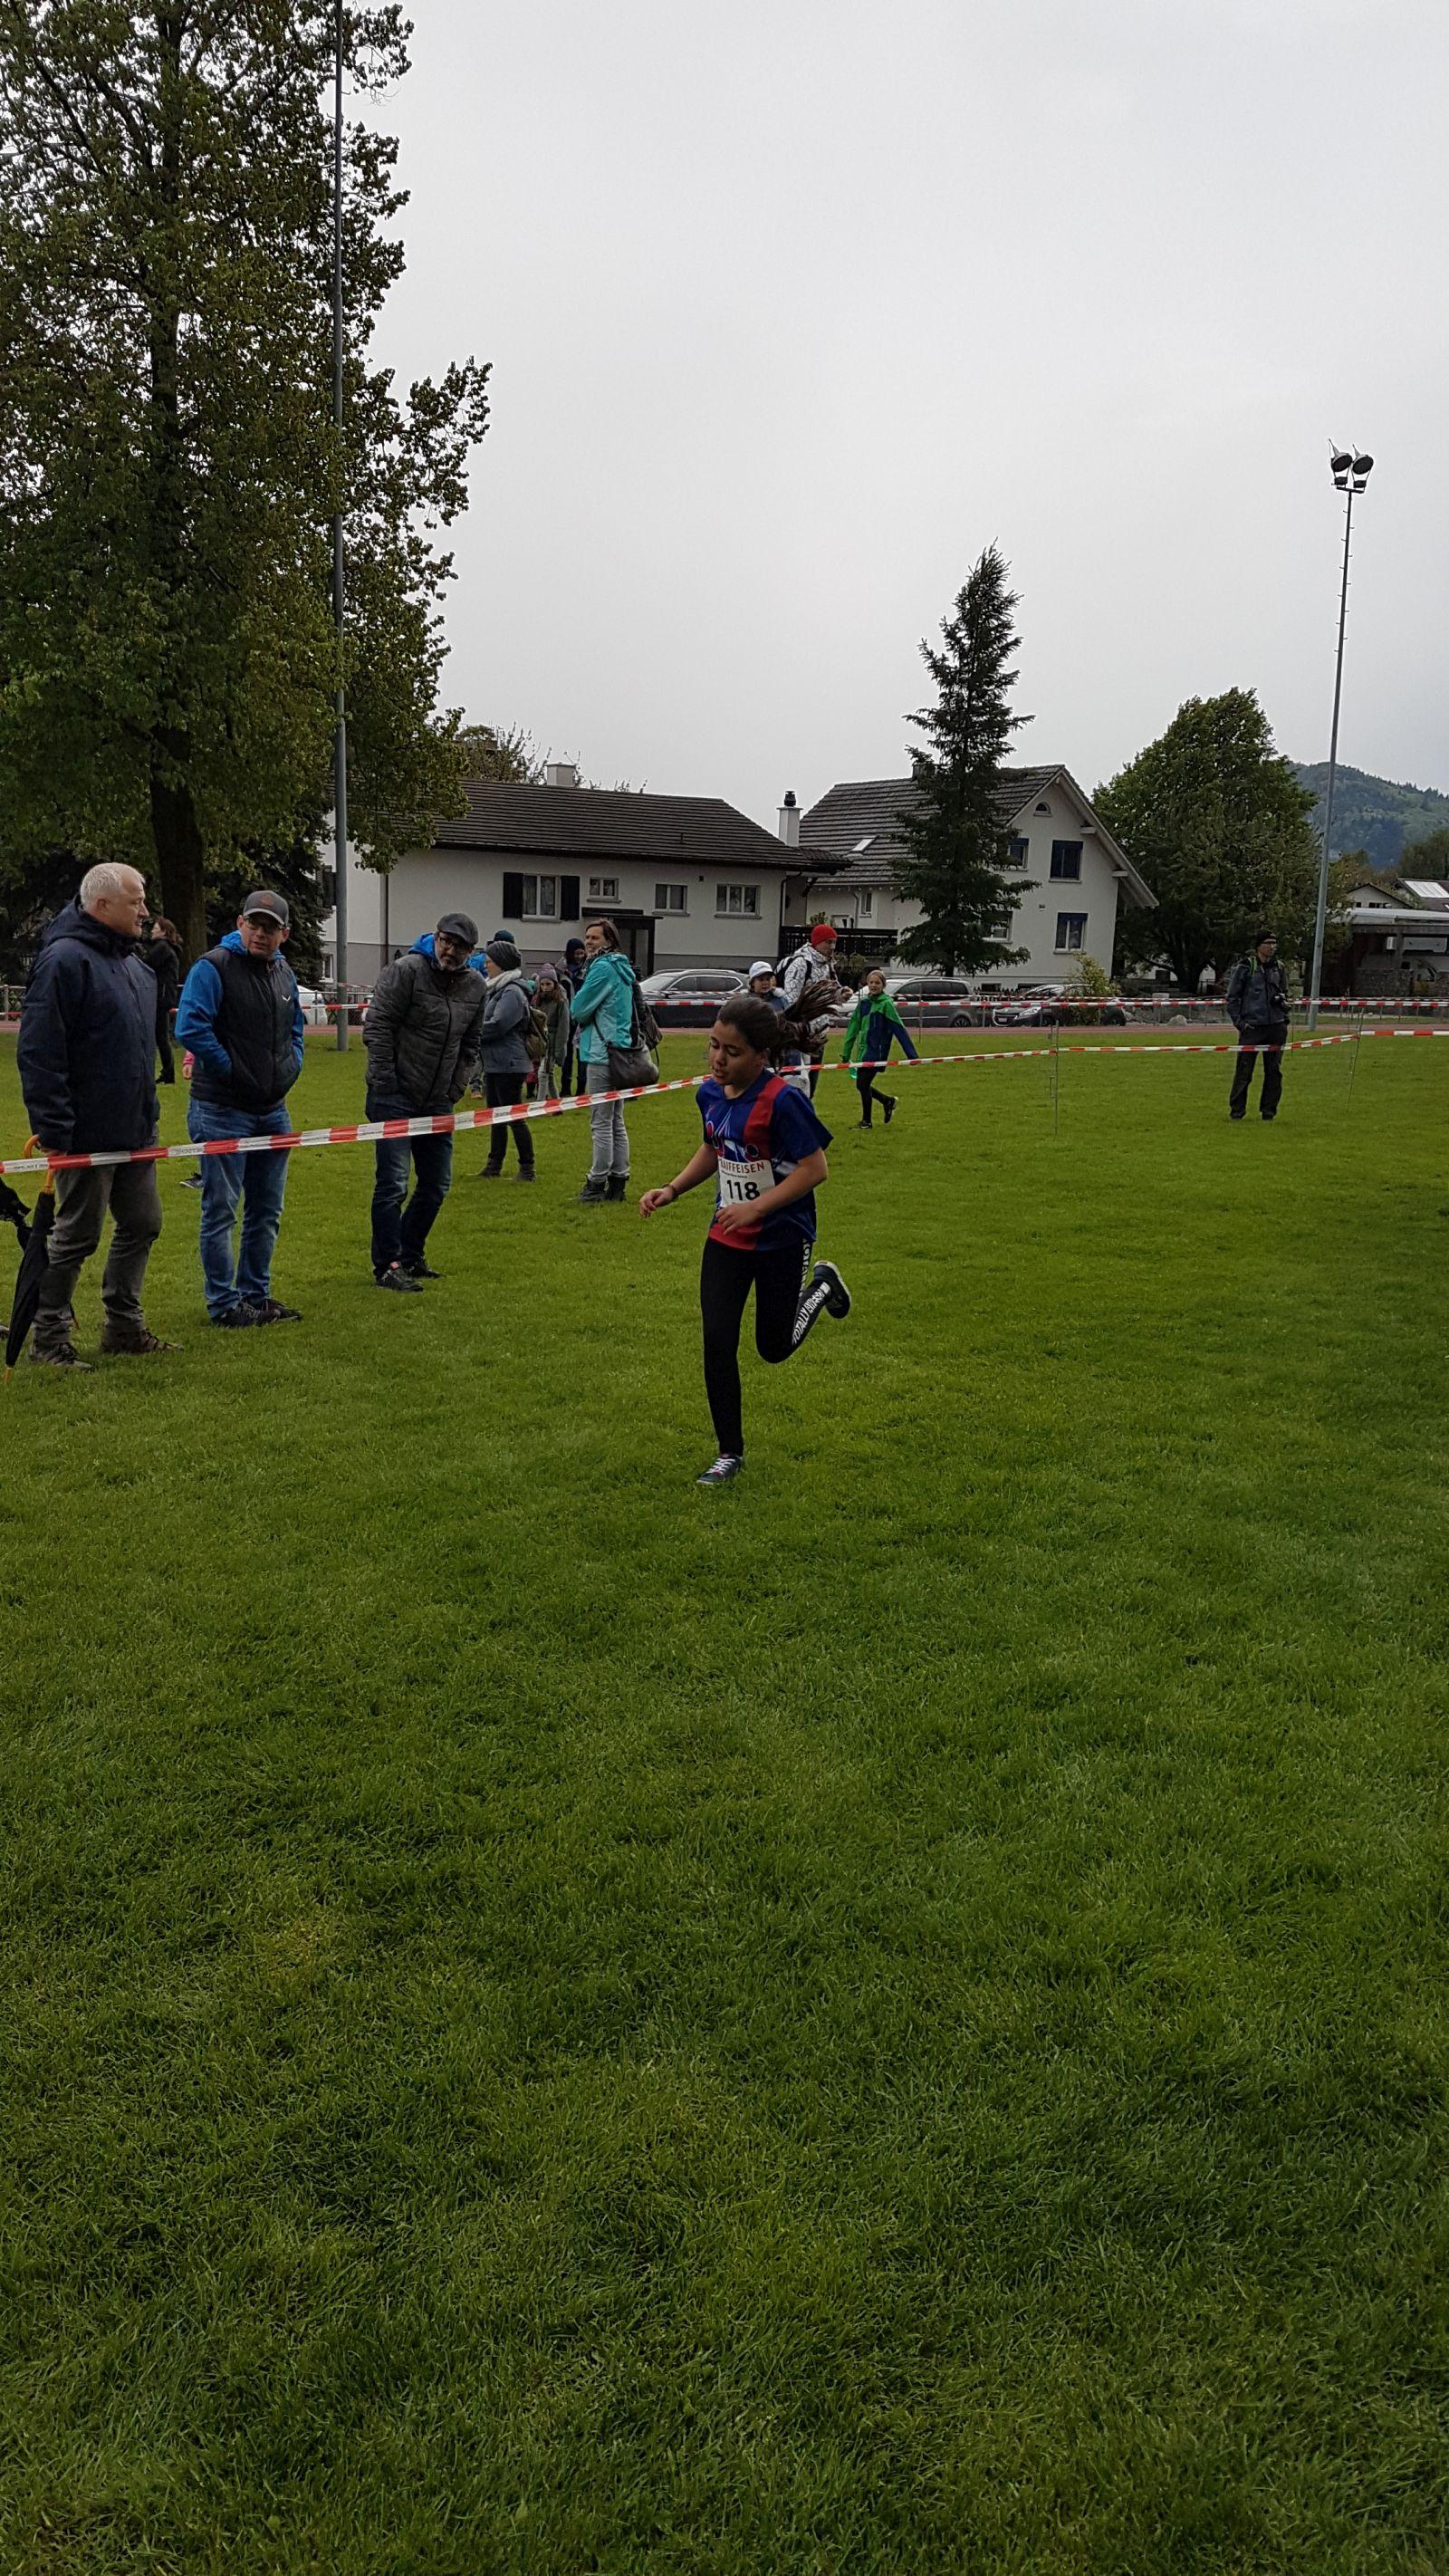 19_usbkidscup32